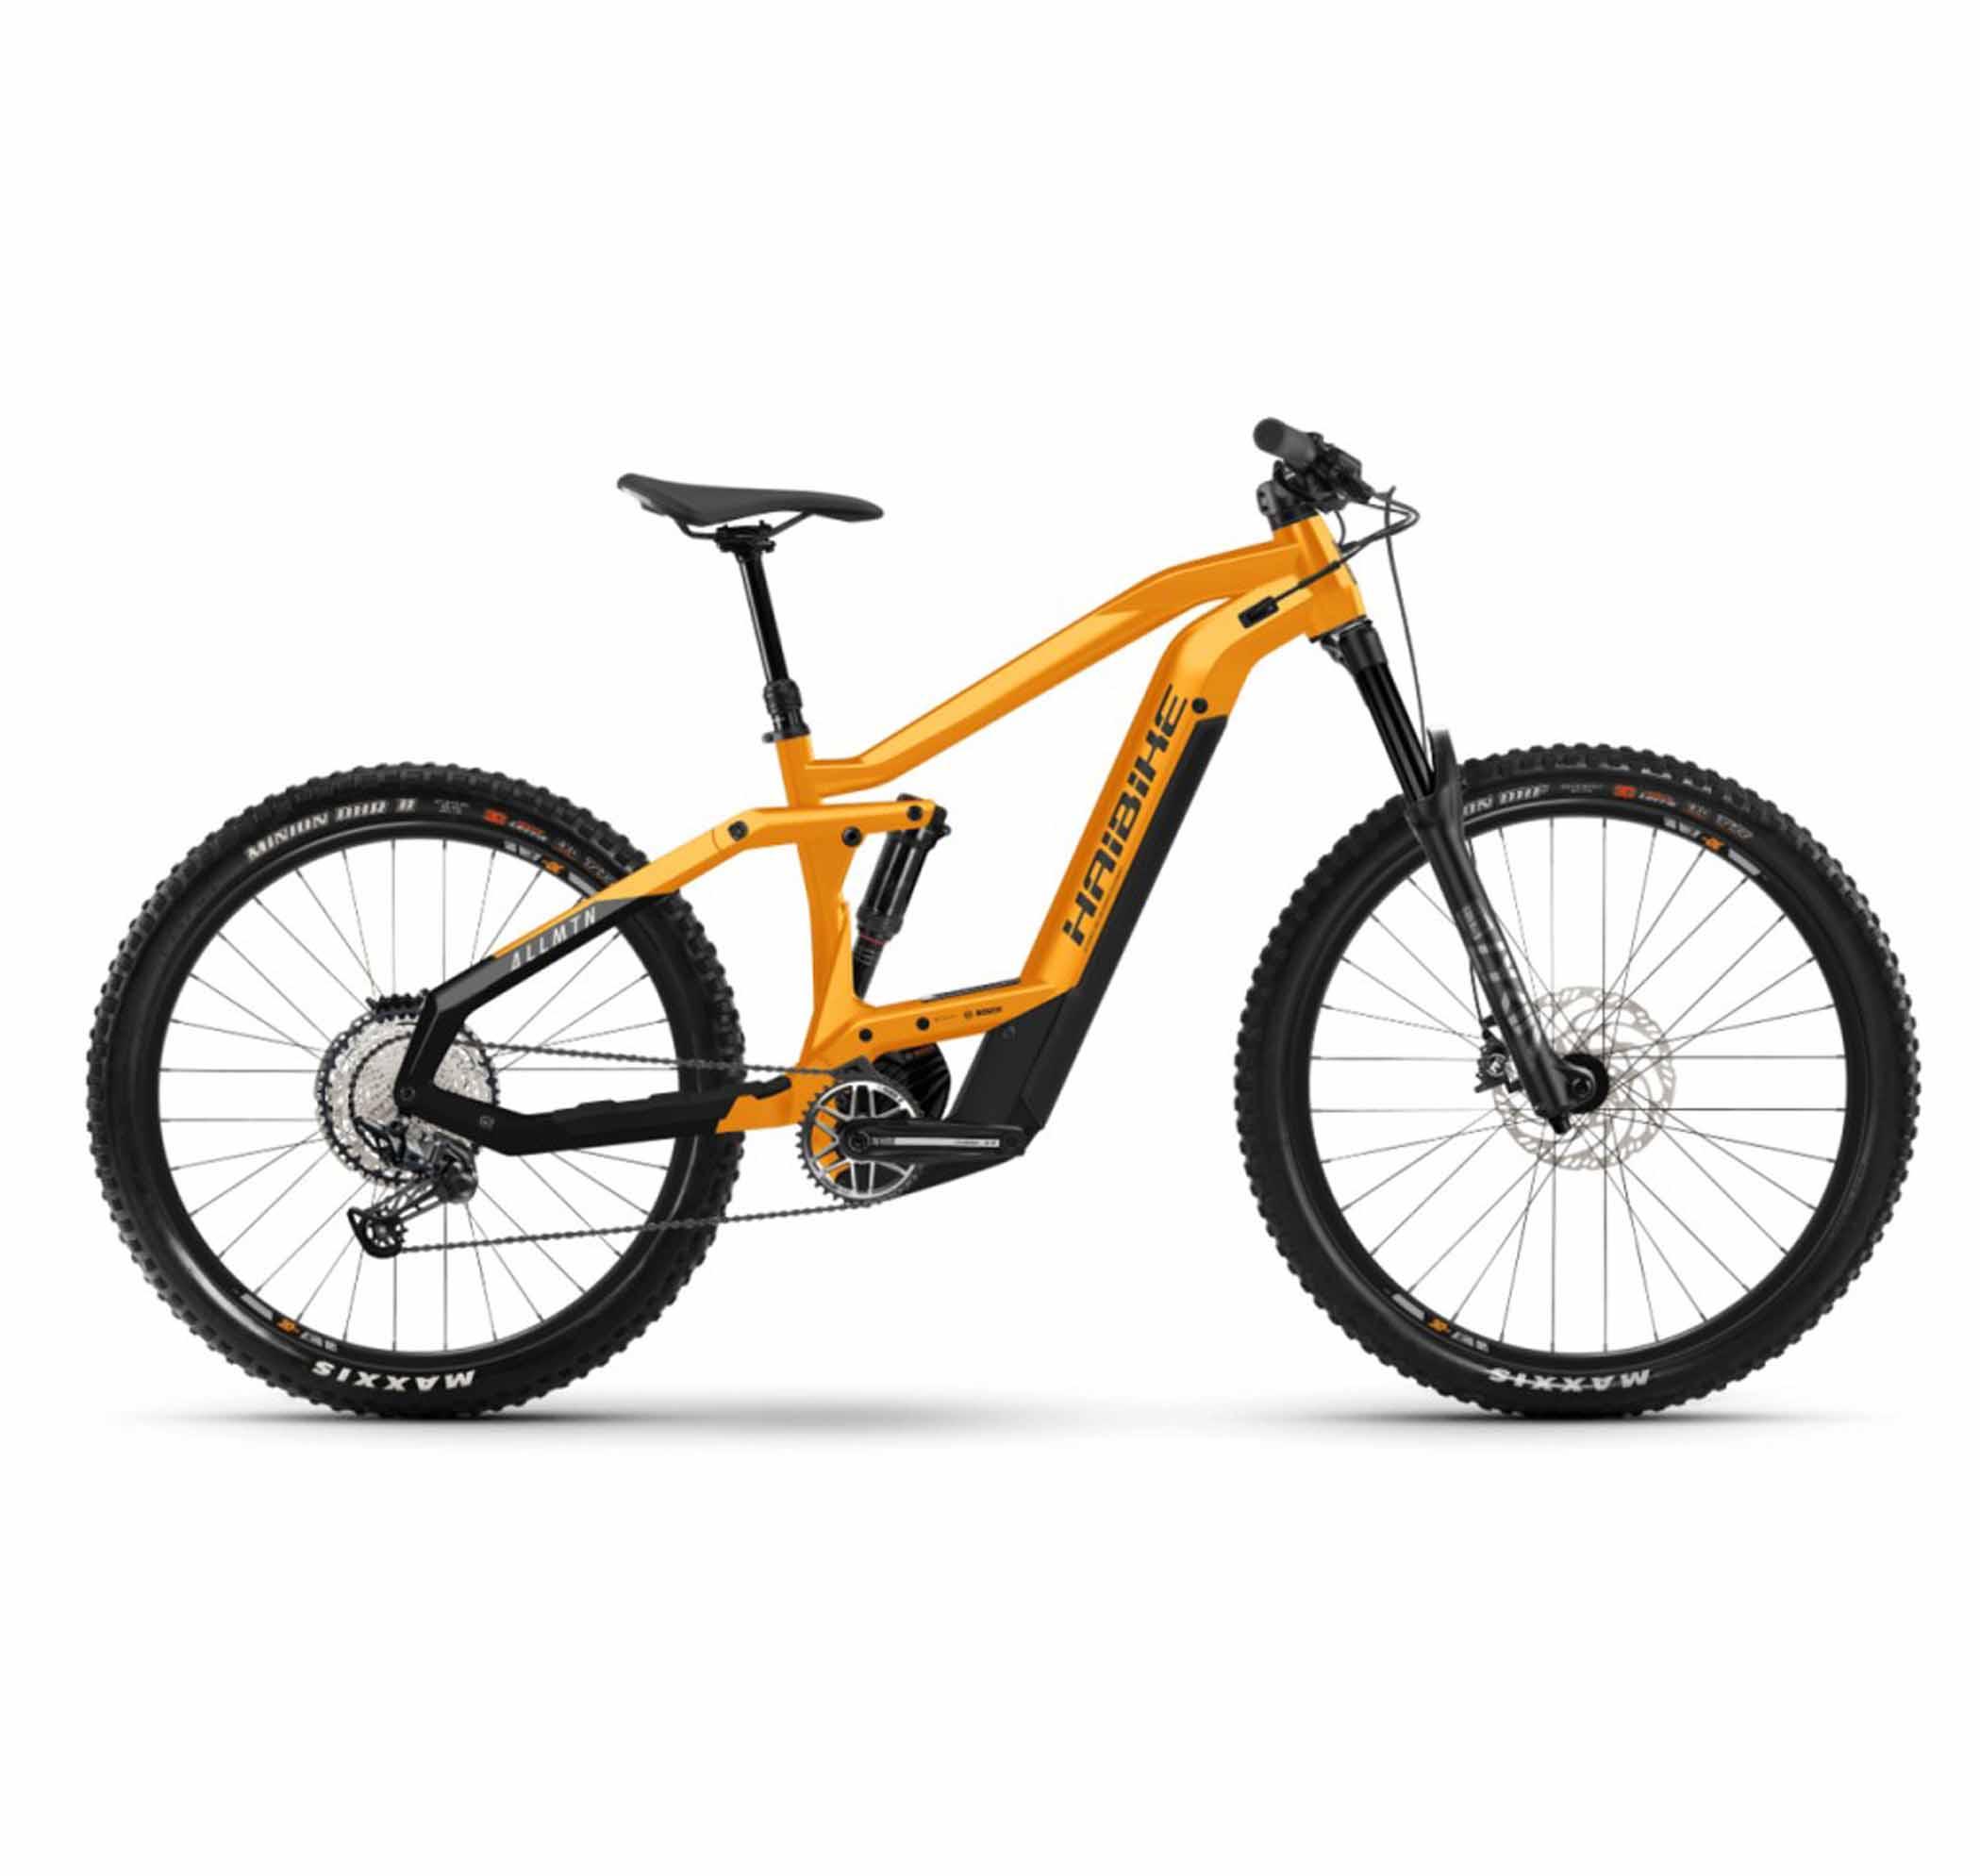 Haibike_Rodeo_Bike_Bosch_Allmtn_4_Lava